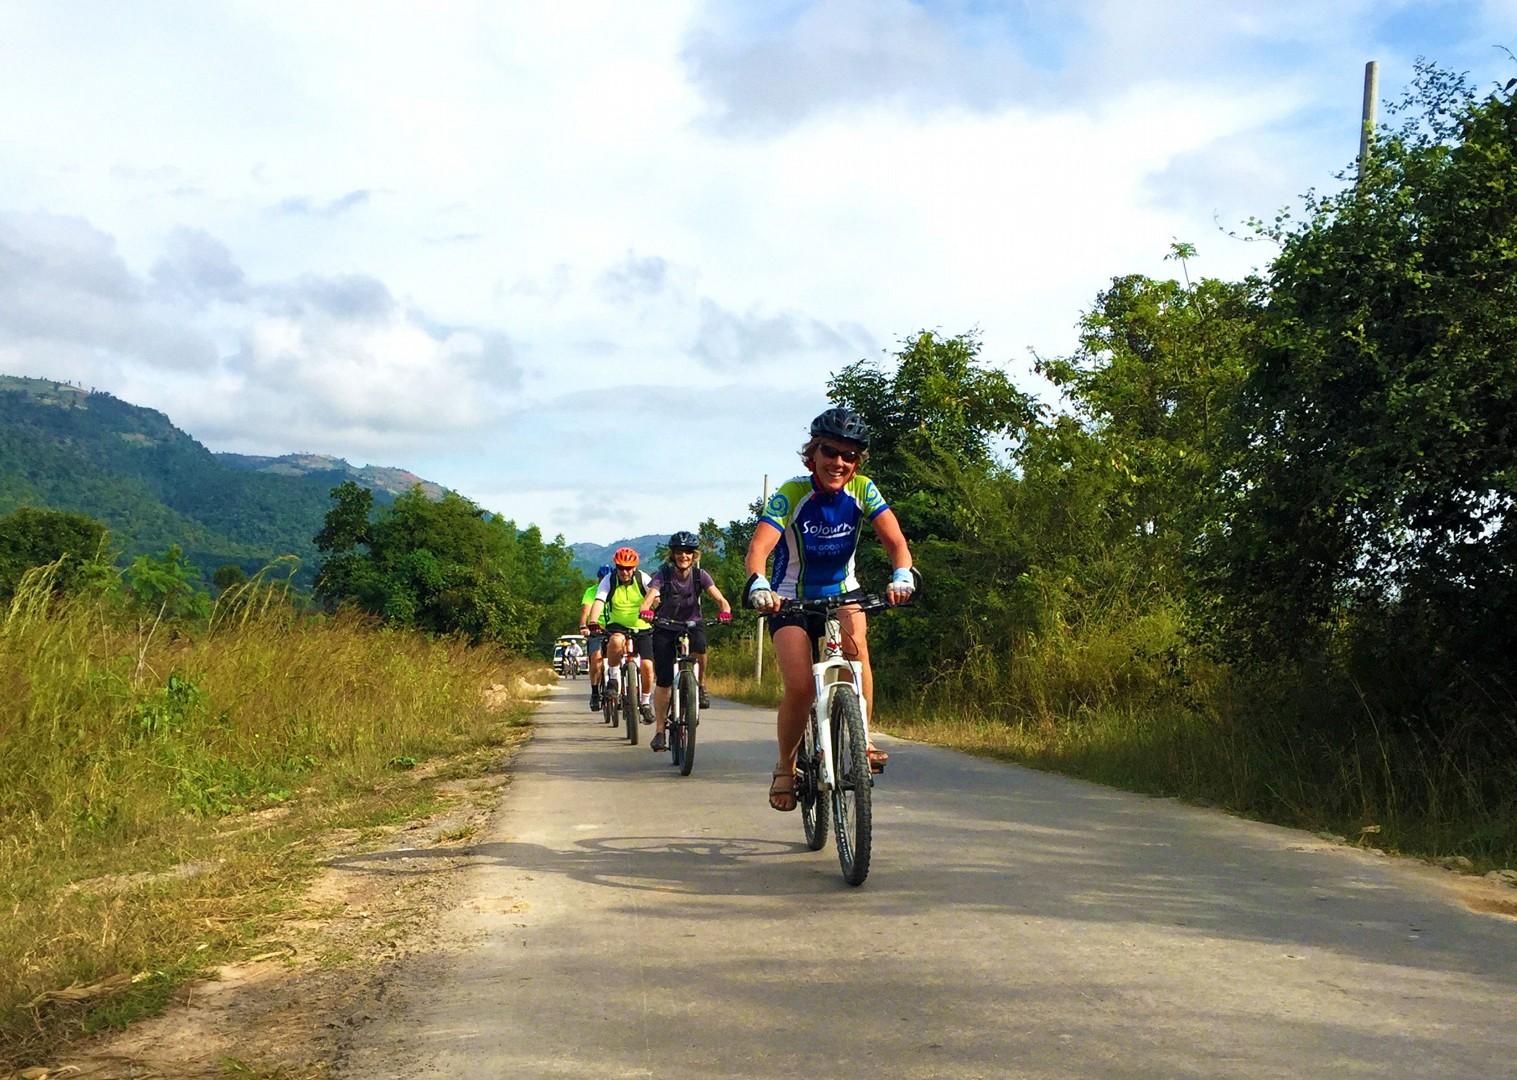 group-cycling-adventure-countryside-burma.jpg - Myanmar (Burma) - Bagan and Beyond - Cycling Adventures